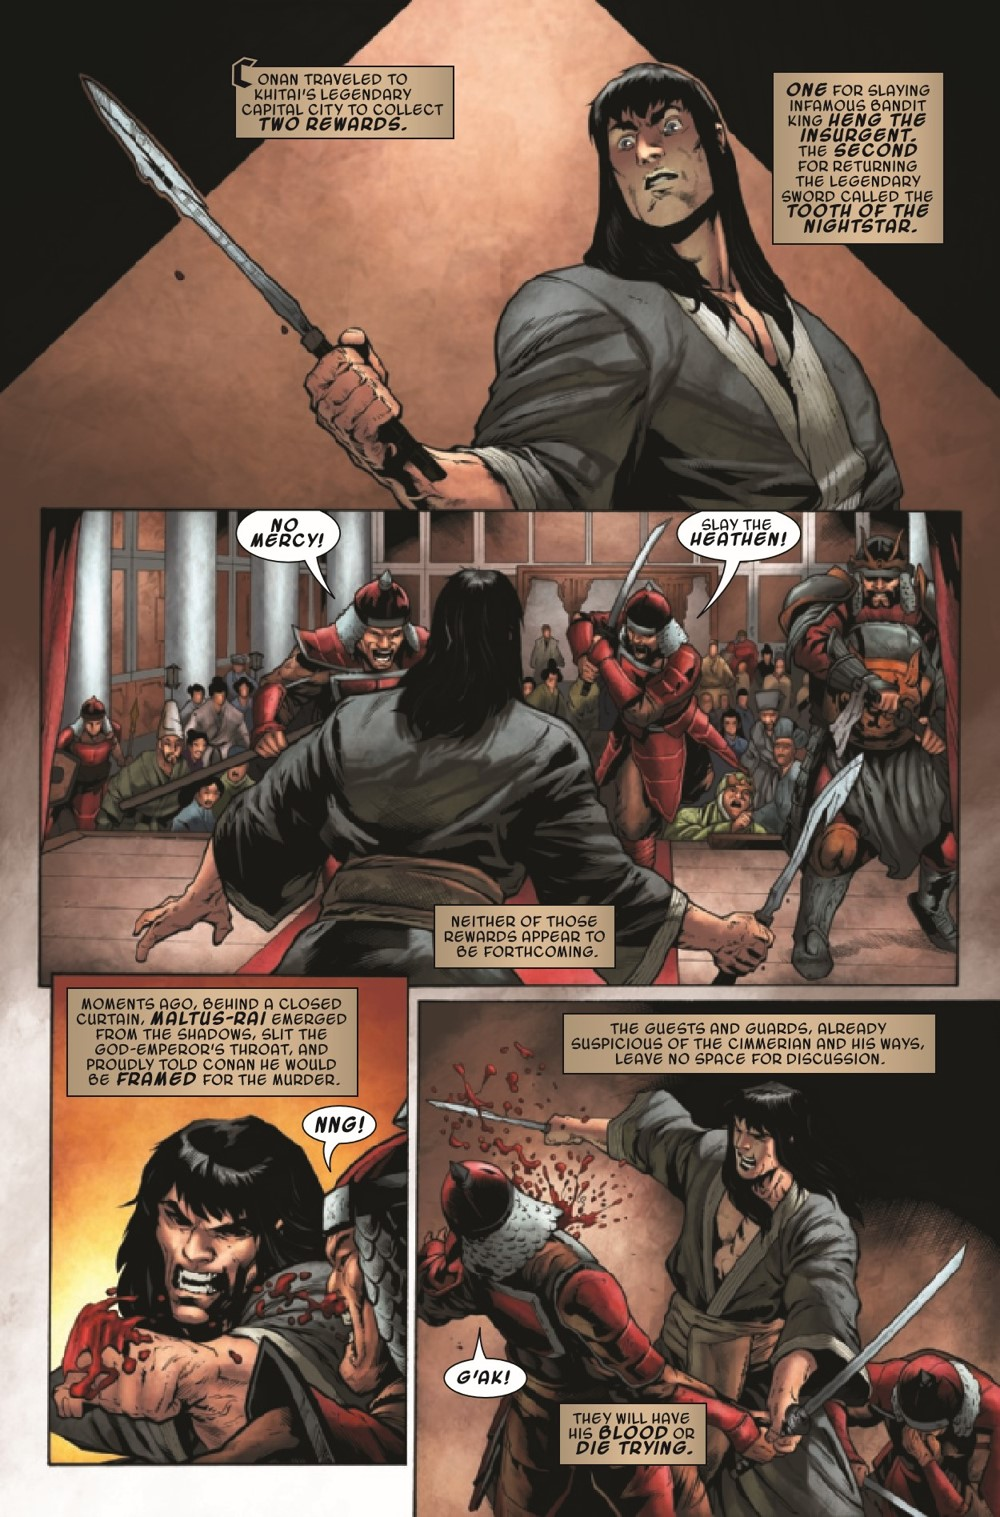 CONANBARB2019023_Preview-3 ComicList Previews: CONAN THE BARBARIAN #23